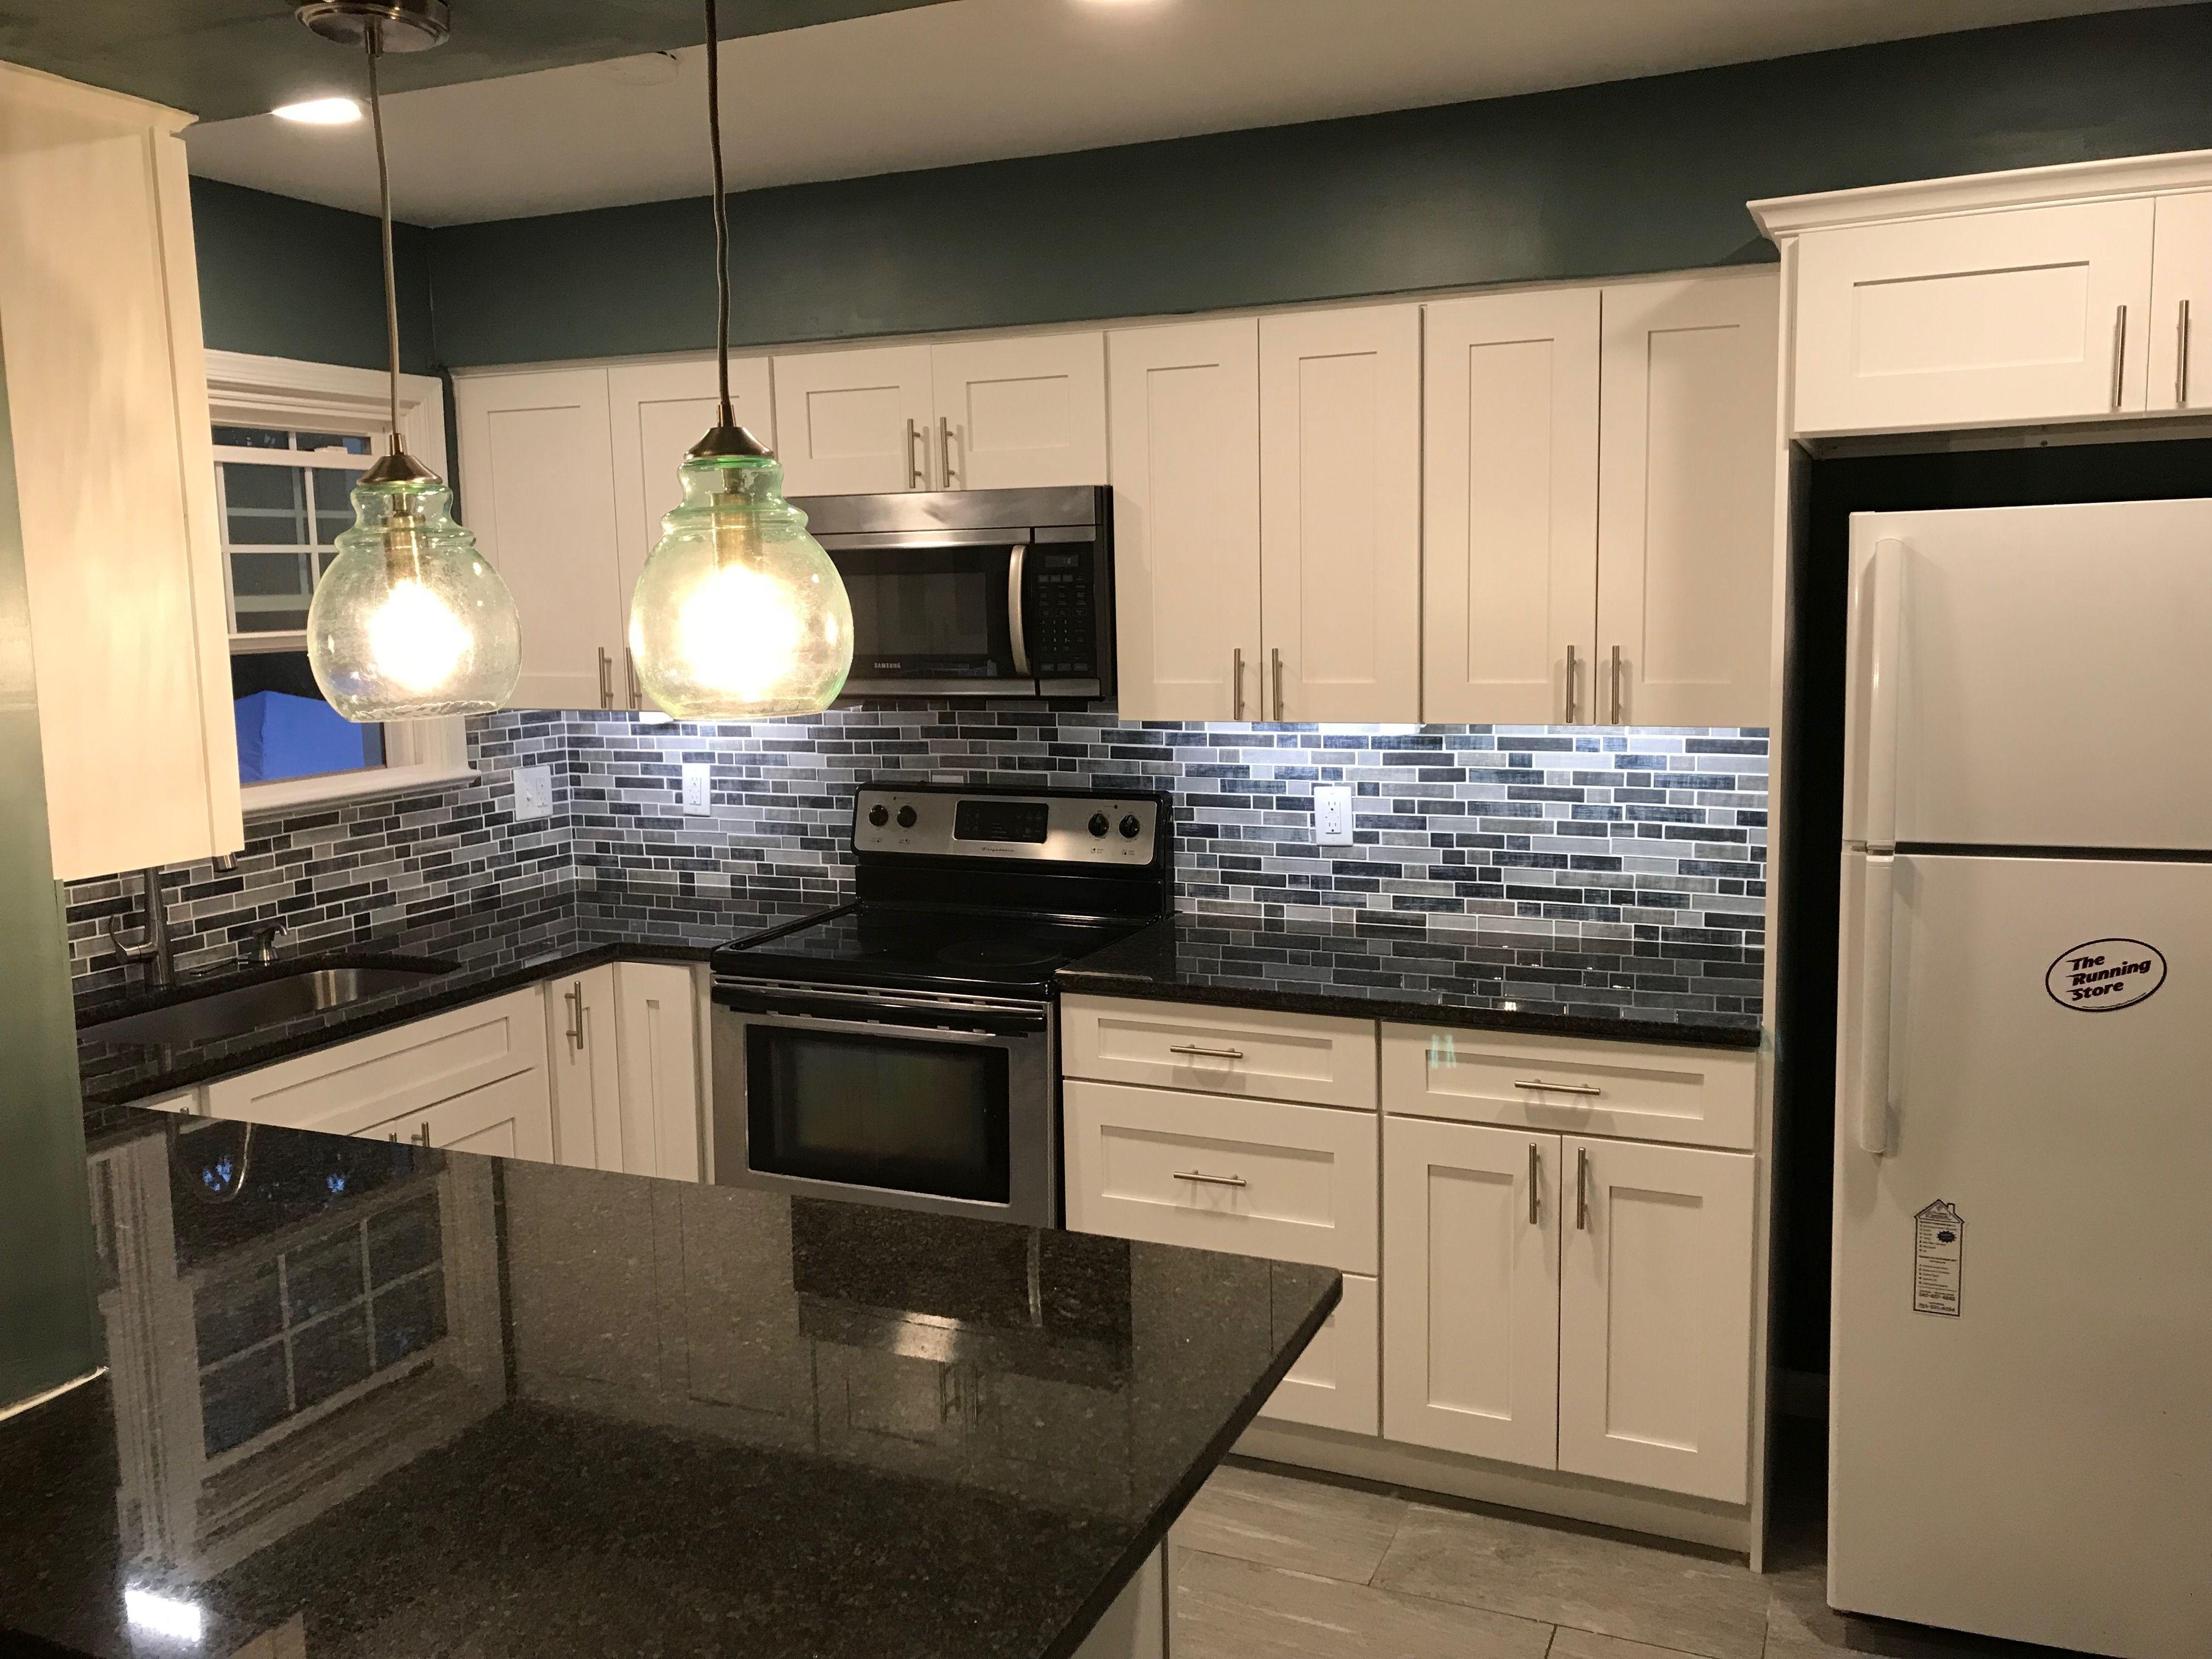 We Create A 3d Design For Your New Kitchen No Surprises Design Kitchen Cabinets Fairfax Fairfaxco Kitchen And Bath Remodeling Kitchen Kitchen And Bath